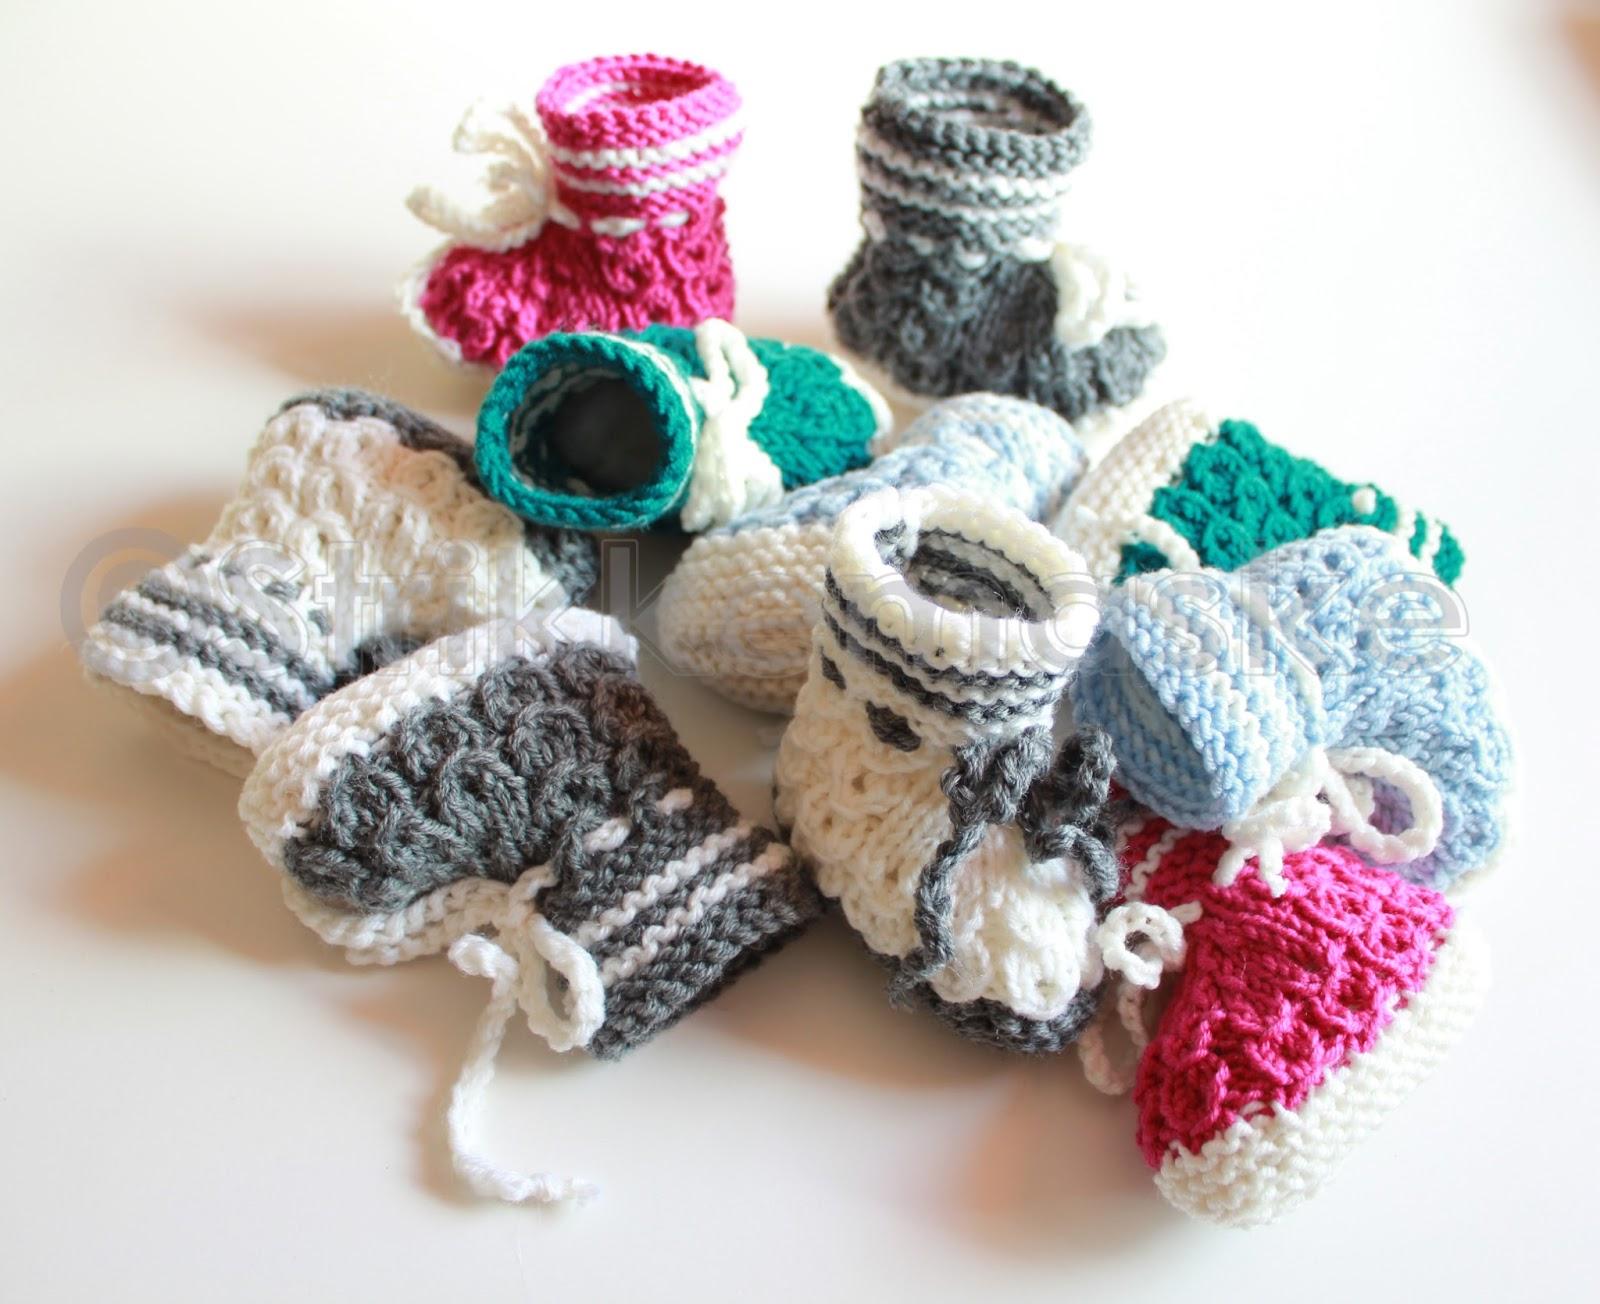 strikka babybooties